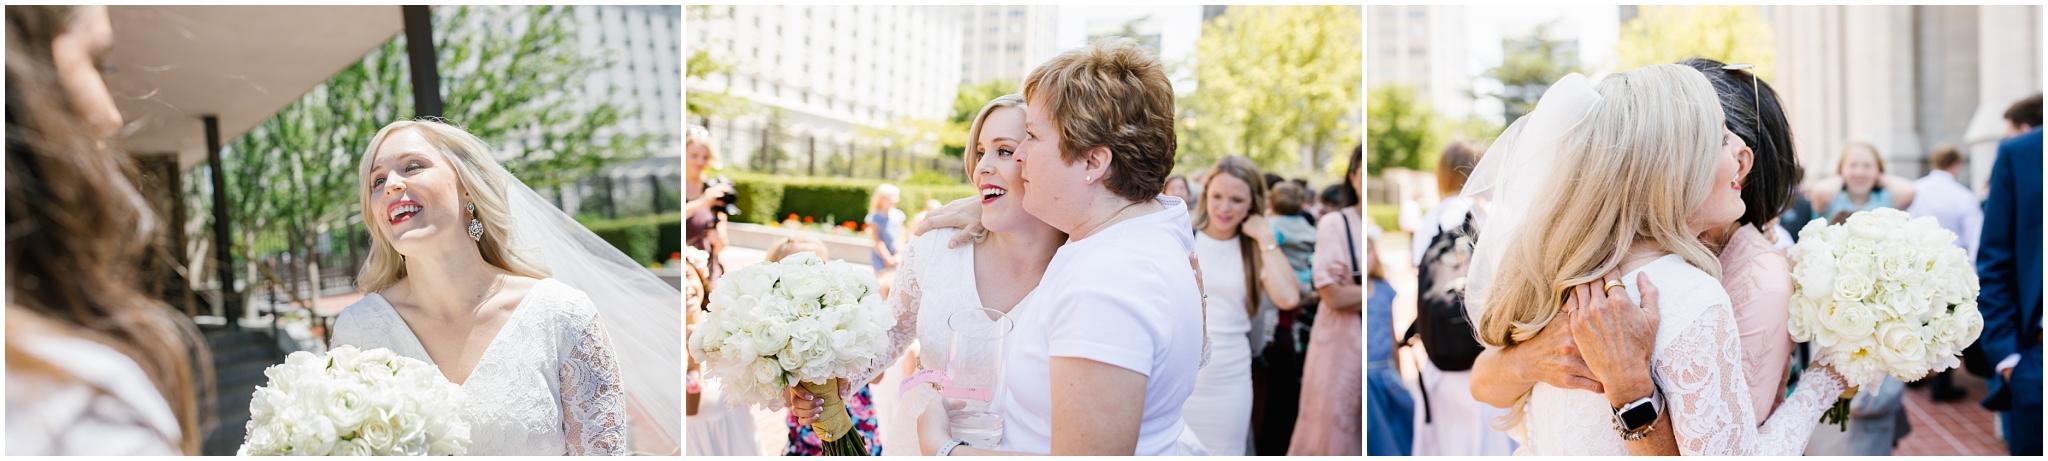 CherylandTyler-12_Lizzie-B-Imagery-Utah-Wedding-Photographer-Salt-Lake-City-Temple-Wells-Fargo-Building-Reception.jpg